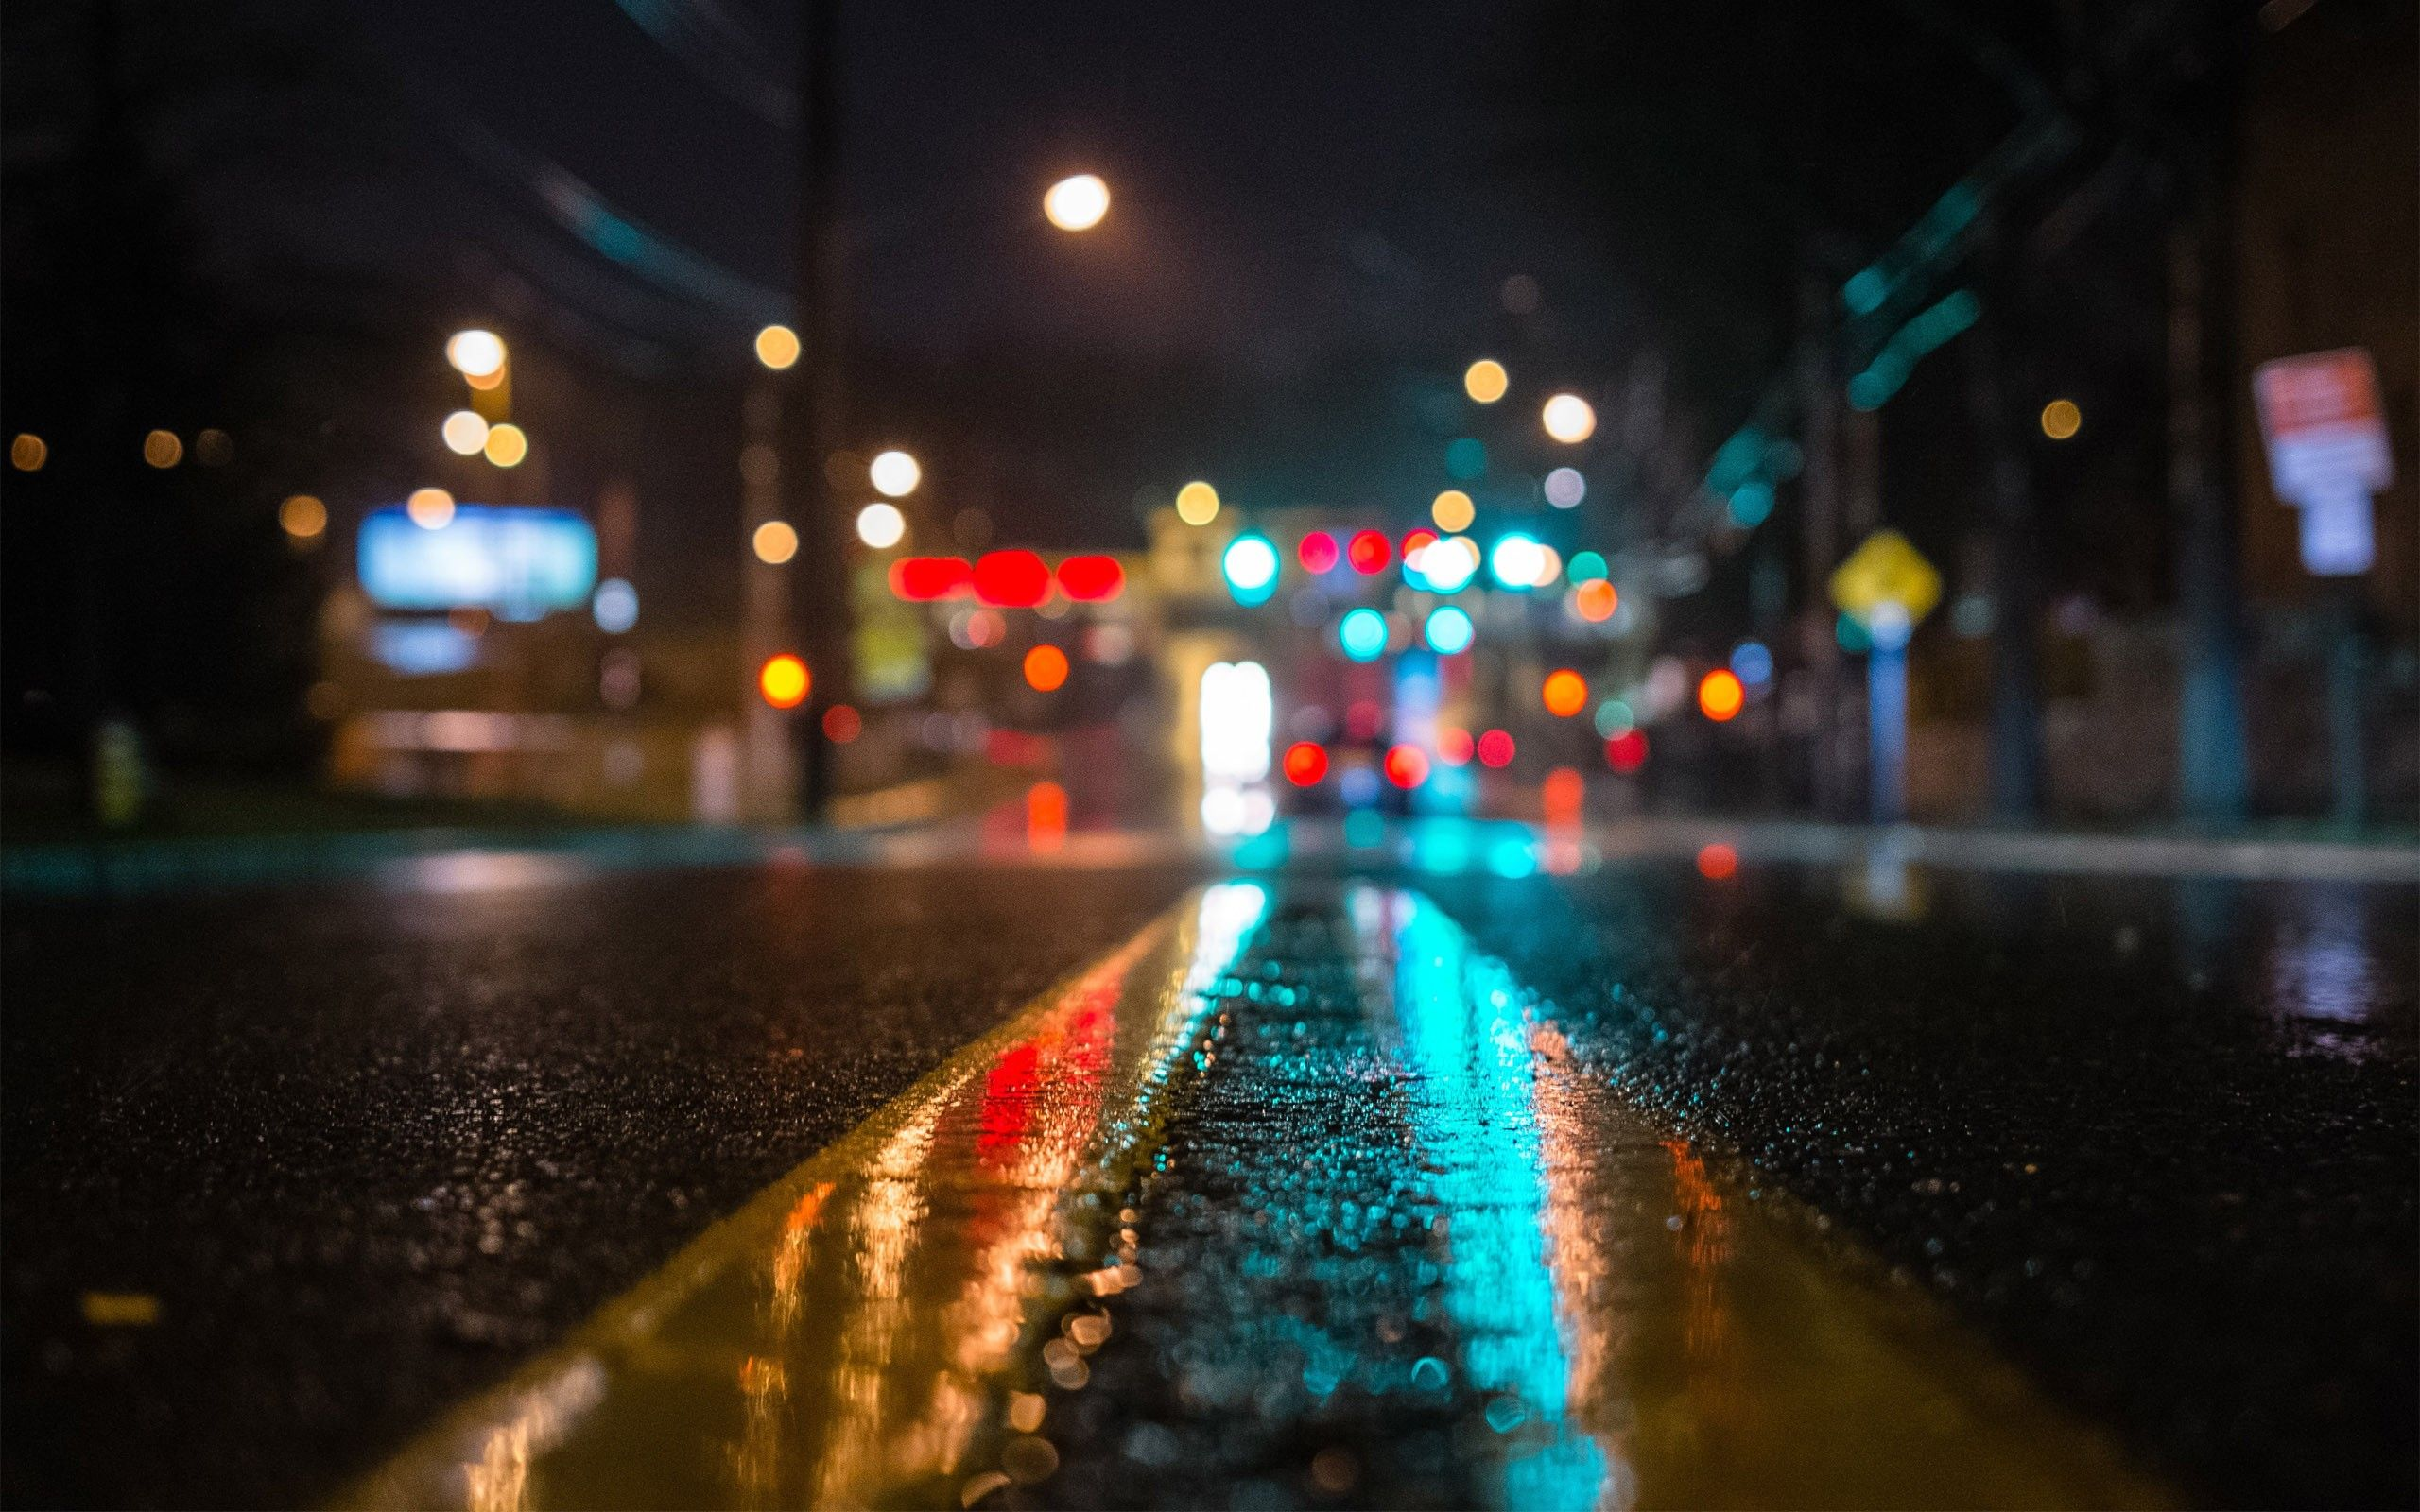 City Blur Wallpapers Top Free City Blur Backgrounds Wallpaperaccess